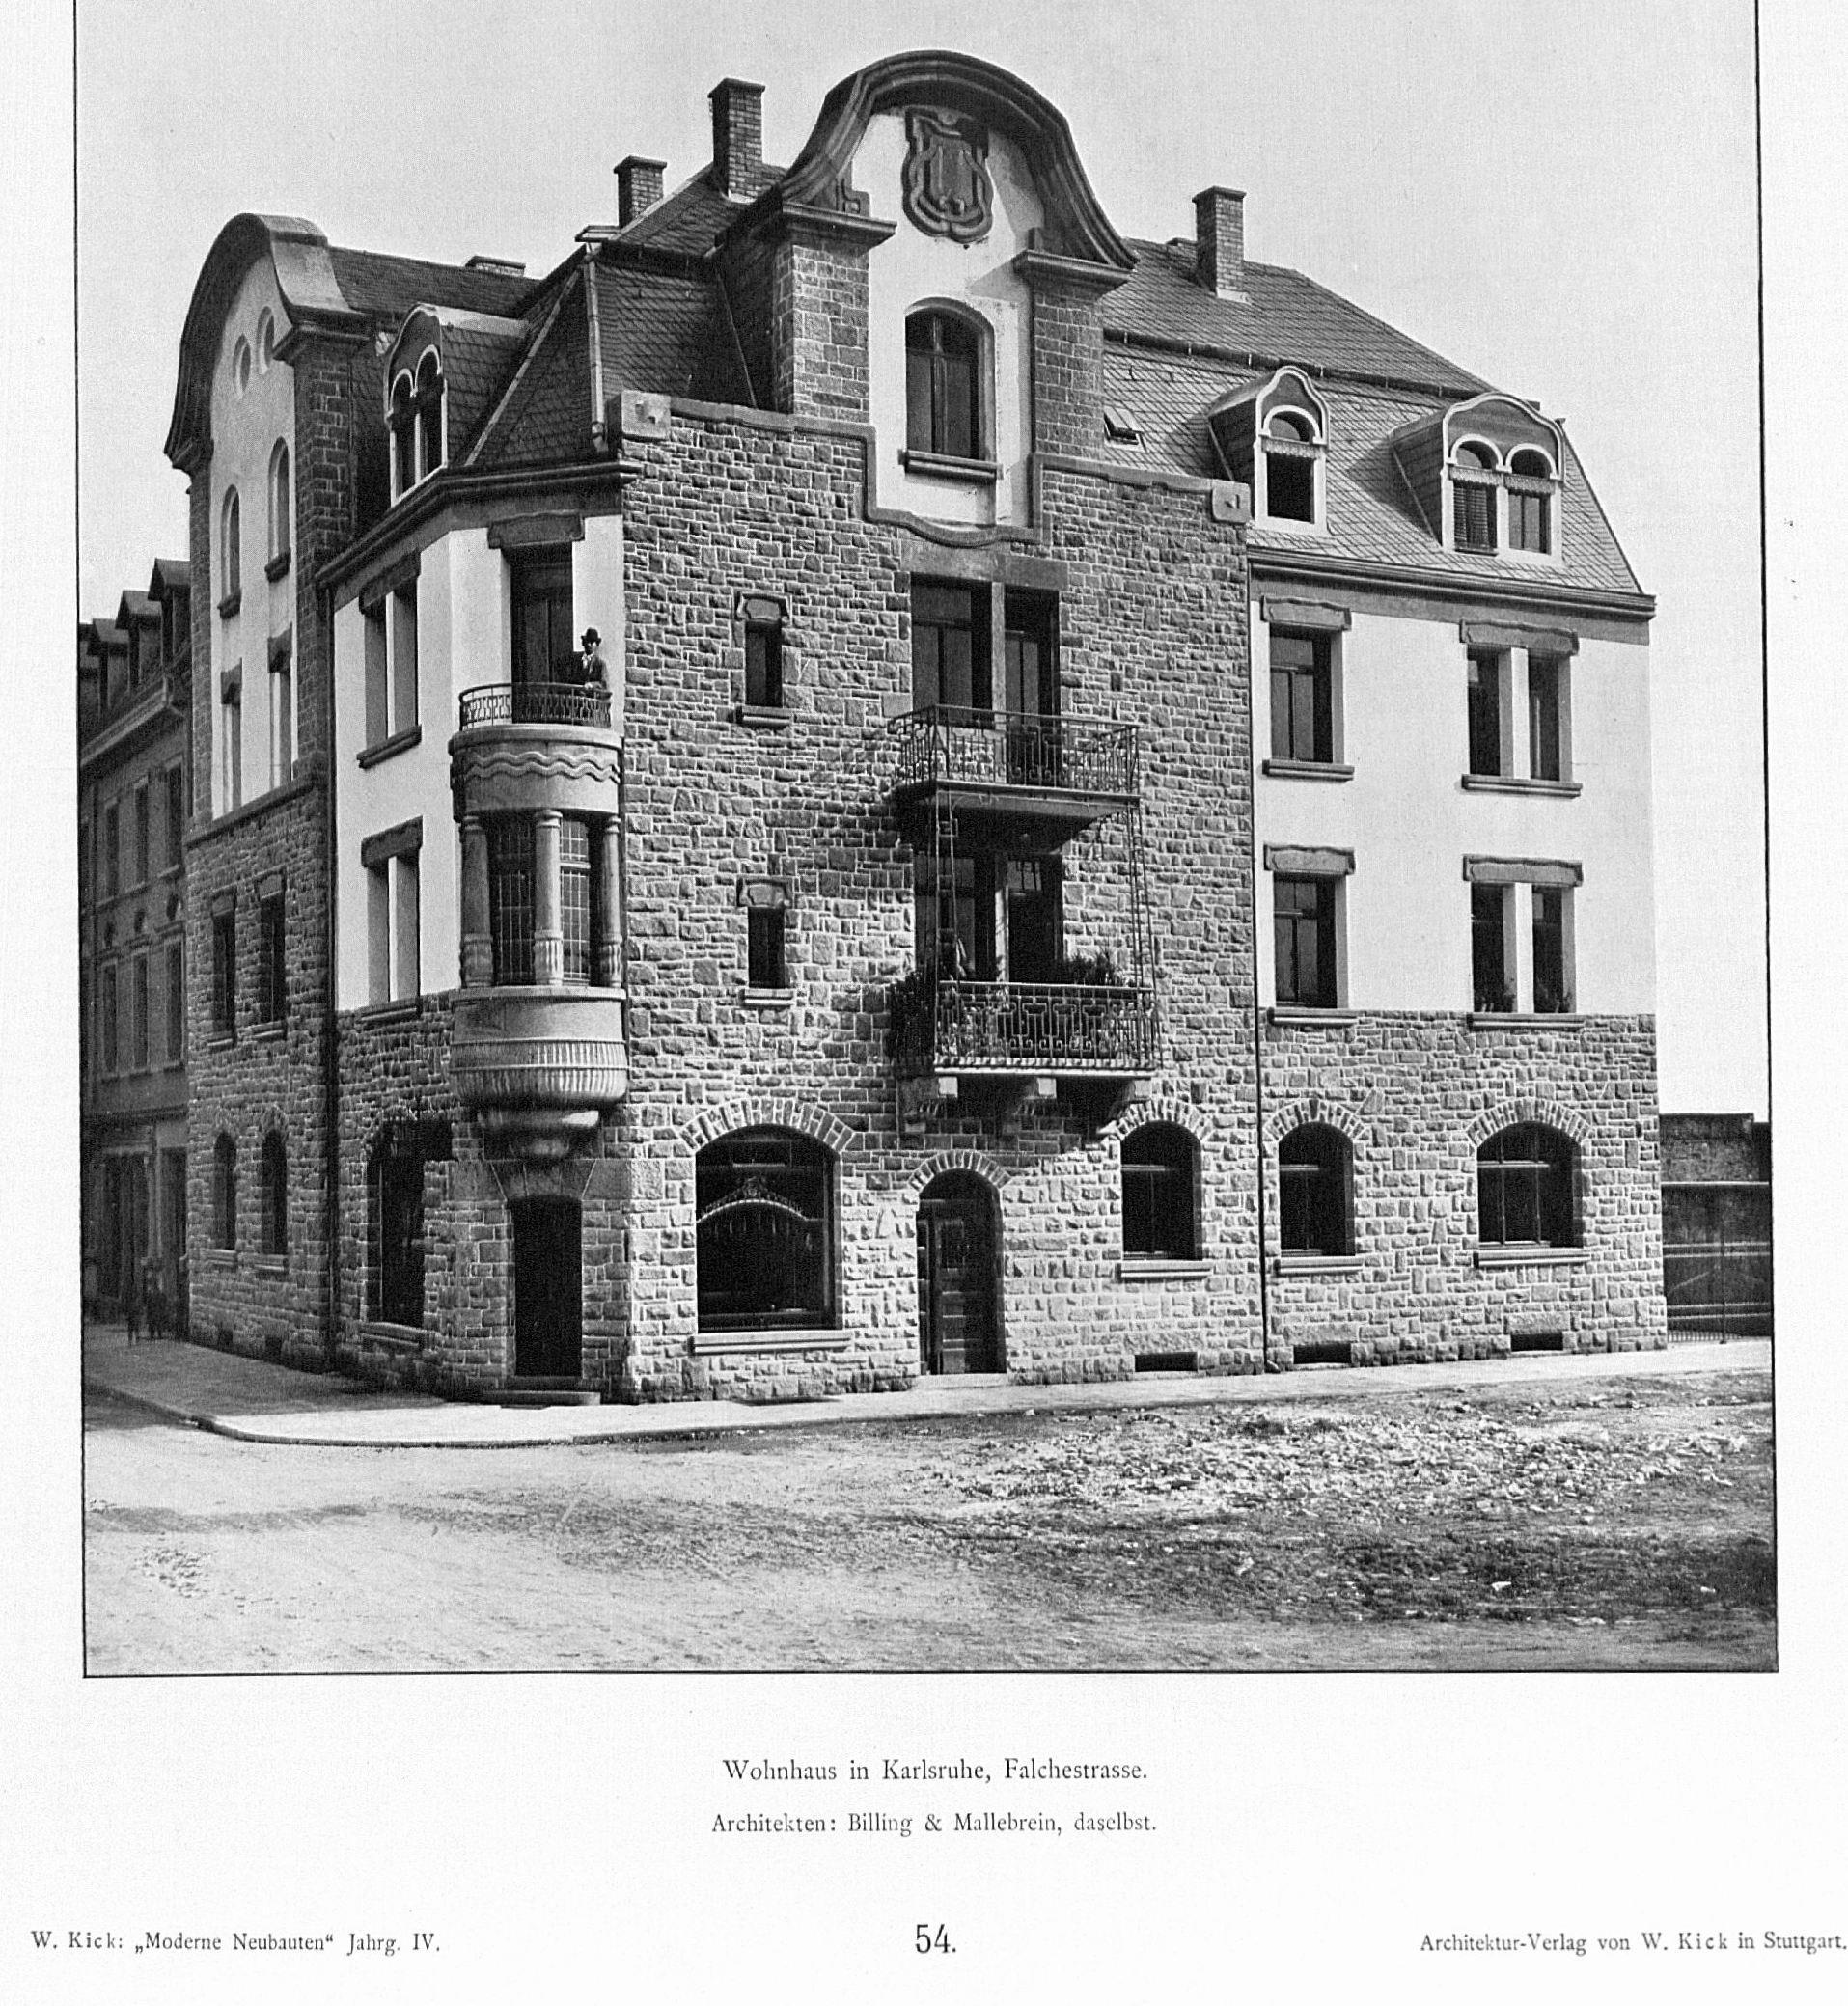 Architekten Karlsruhe file haus in karlsruhe falchestrasse architekten billing